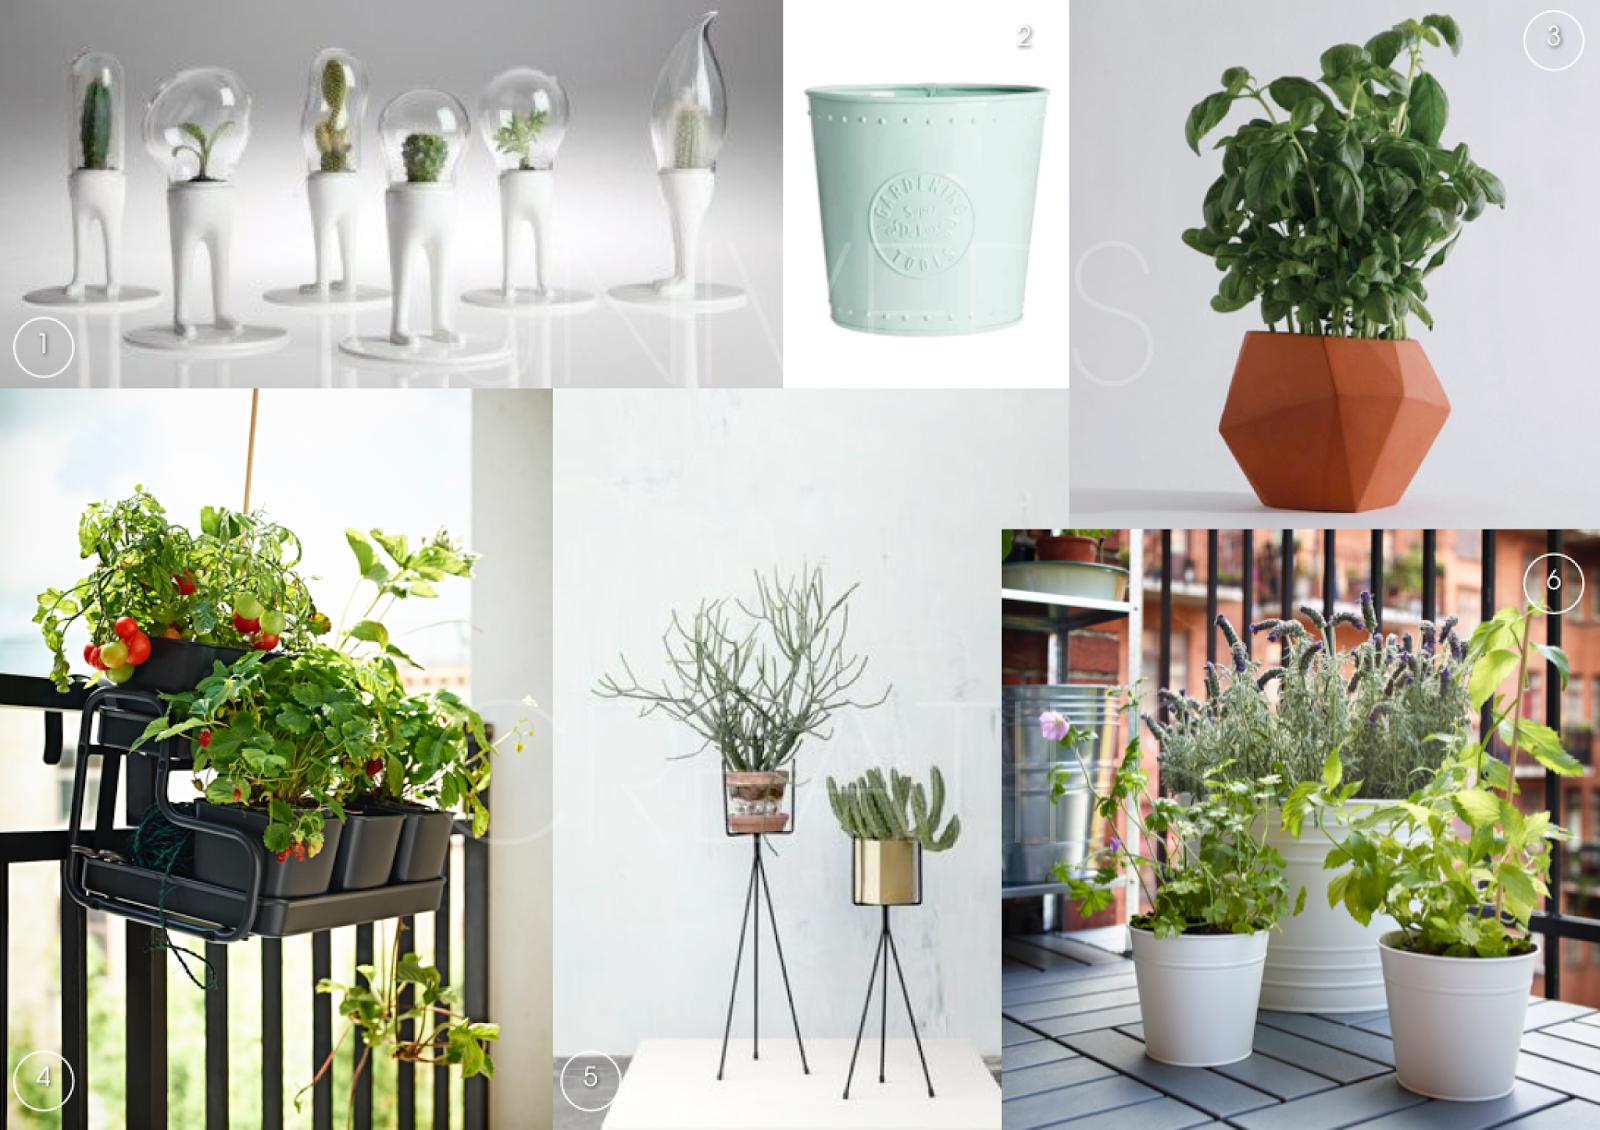 univers creatifs design trouver pot sa plante. Black Bedroom Furniture Sets. Home Design Ideas